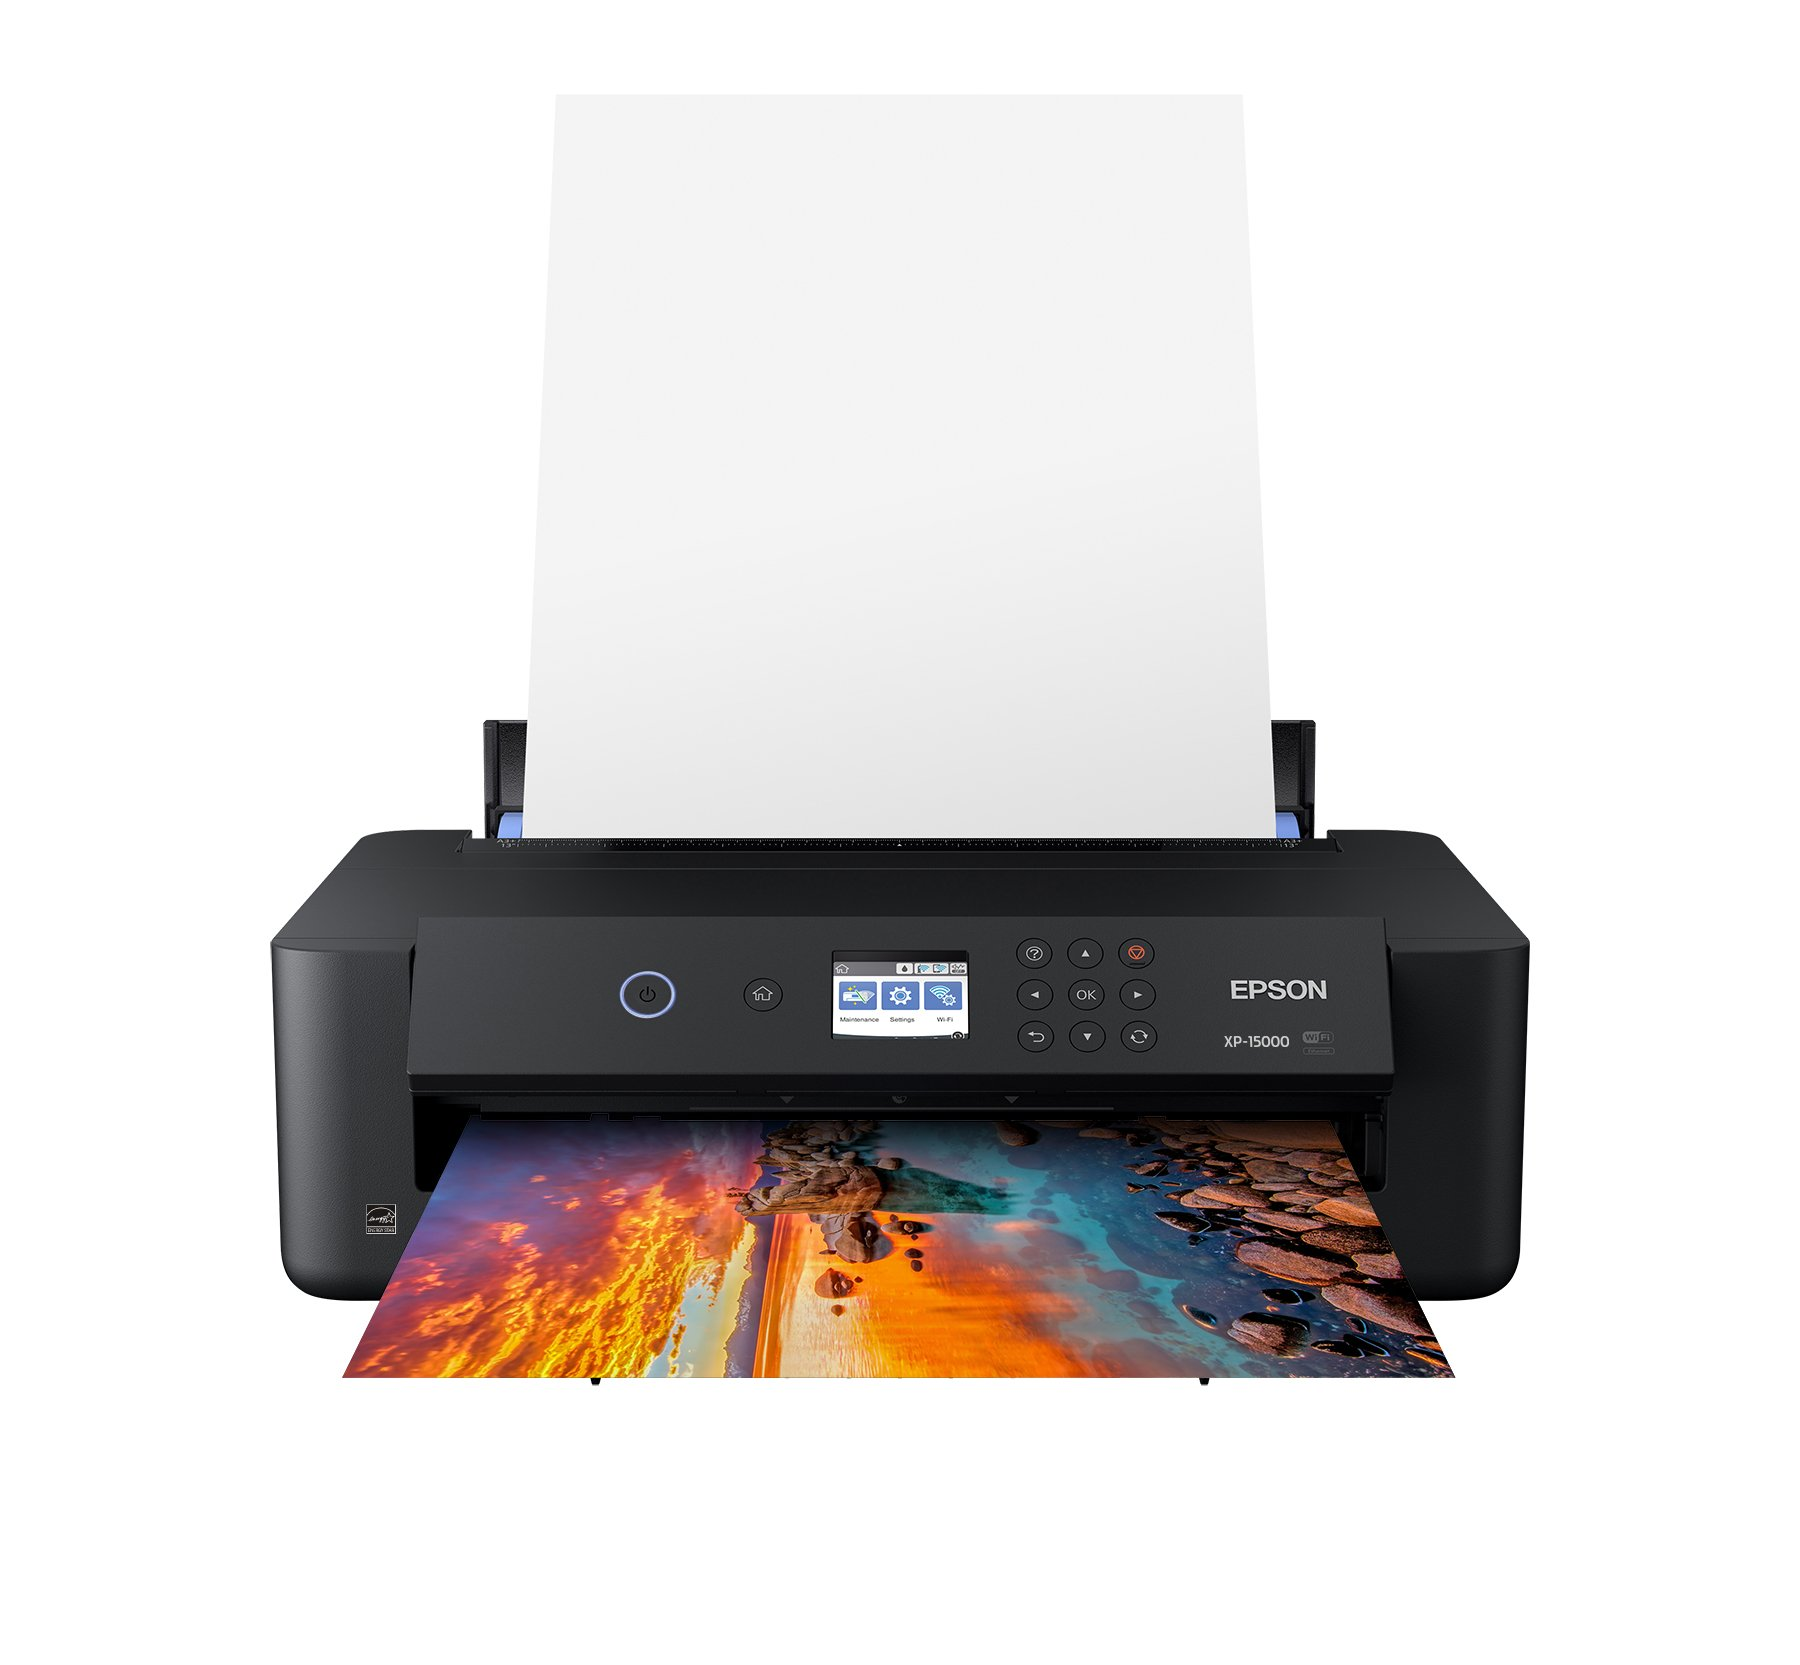 Epson Expression Photo HD XP-15000 Wireless Color Wide-Format Printer, Amazon Dash Replenishment Ready